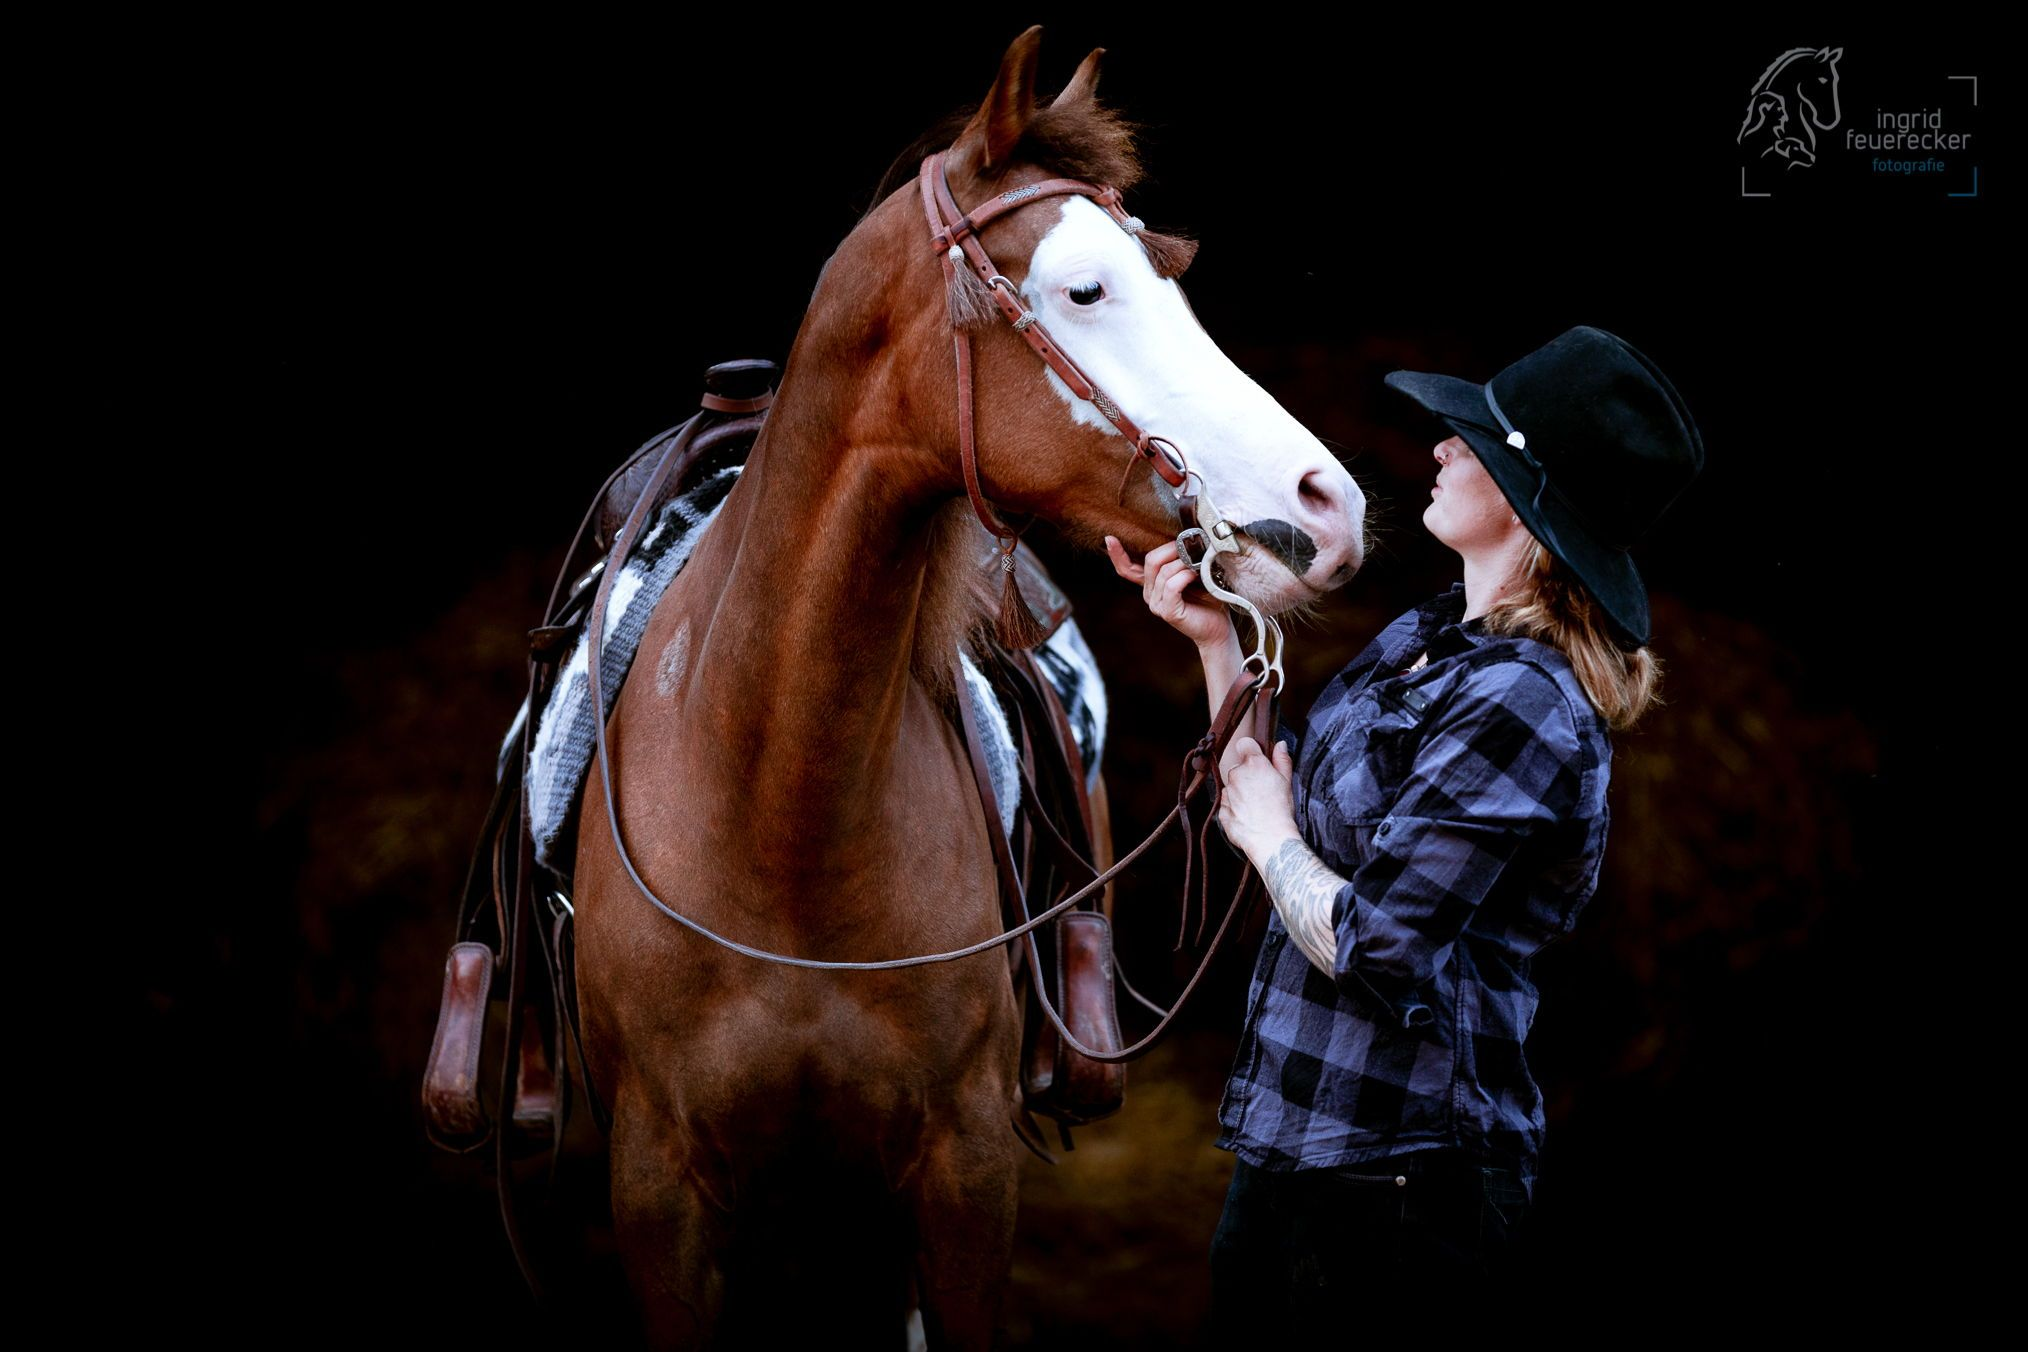 Ingrid Feuerecker Pferdefotografie Ingrid Feuerecker Hundefotografie Pferd Und Mensch Vor Schw Pferde Fotografie Pferde Madchen Fotografie Pferdefotografie